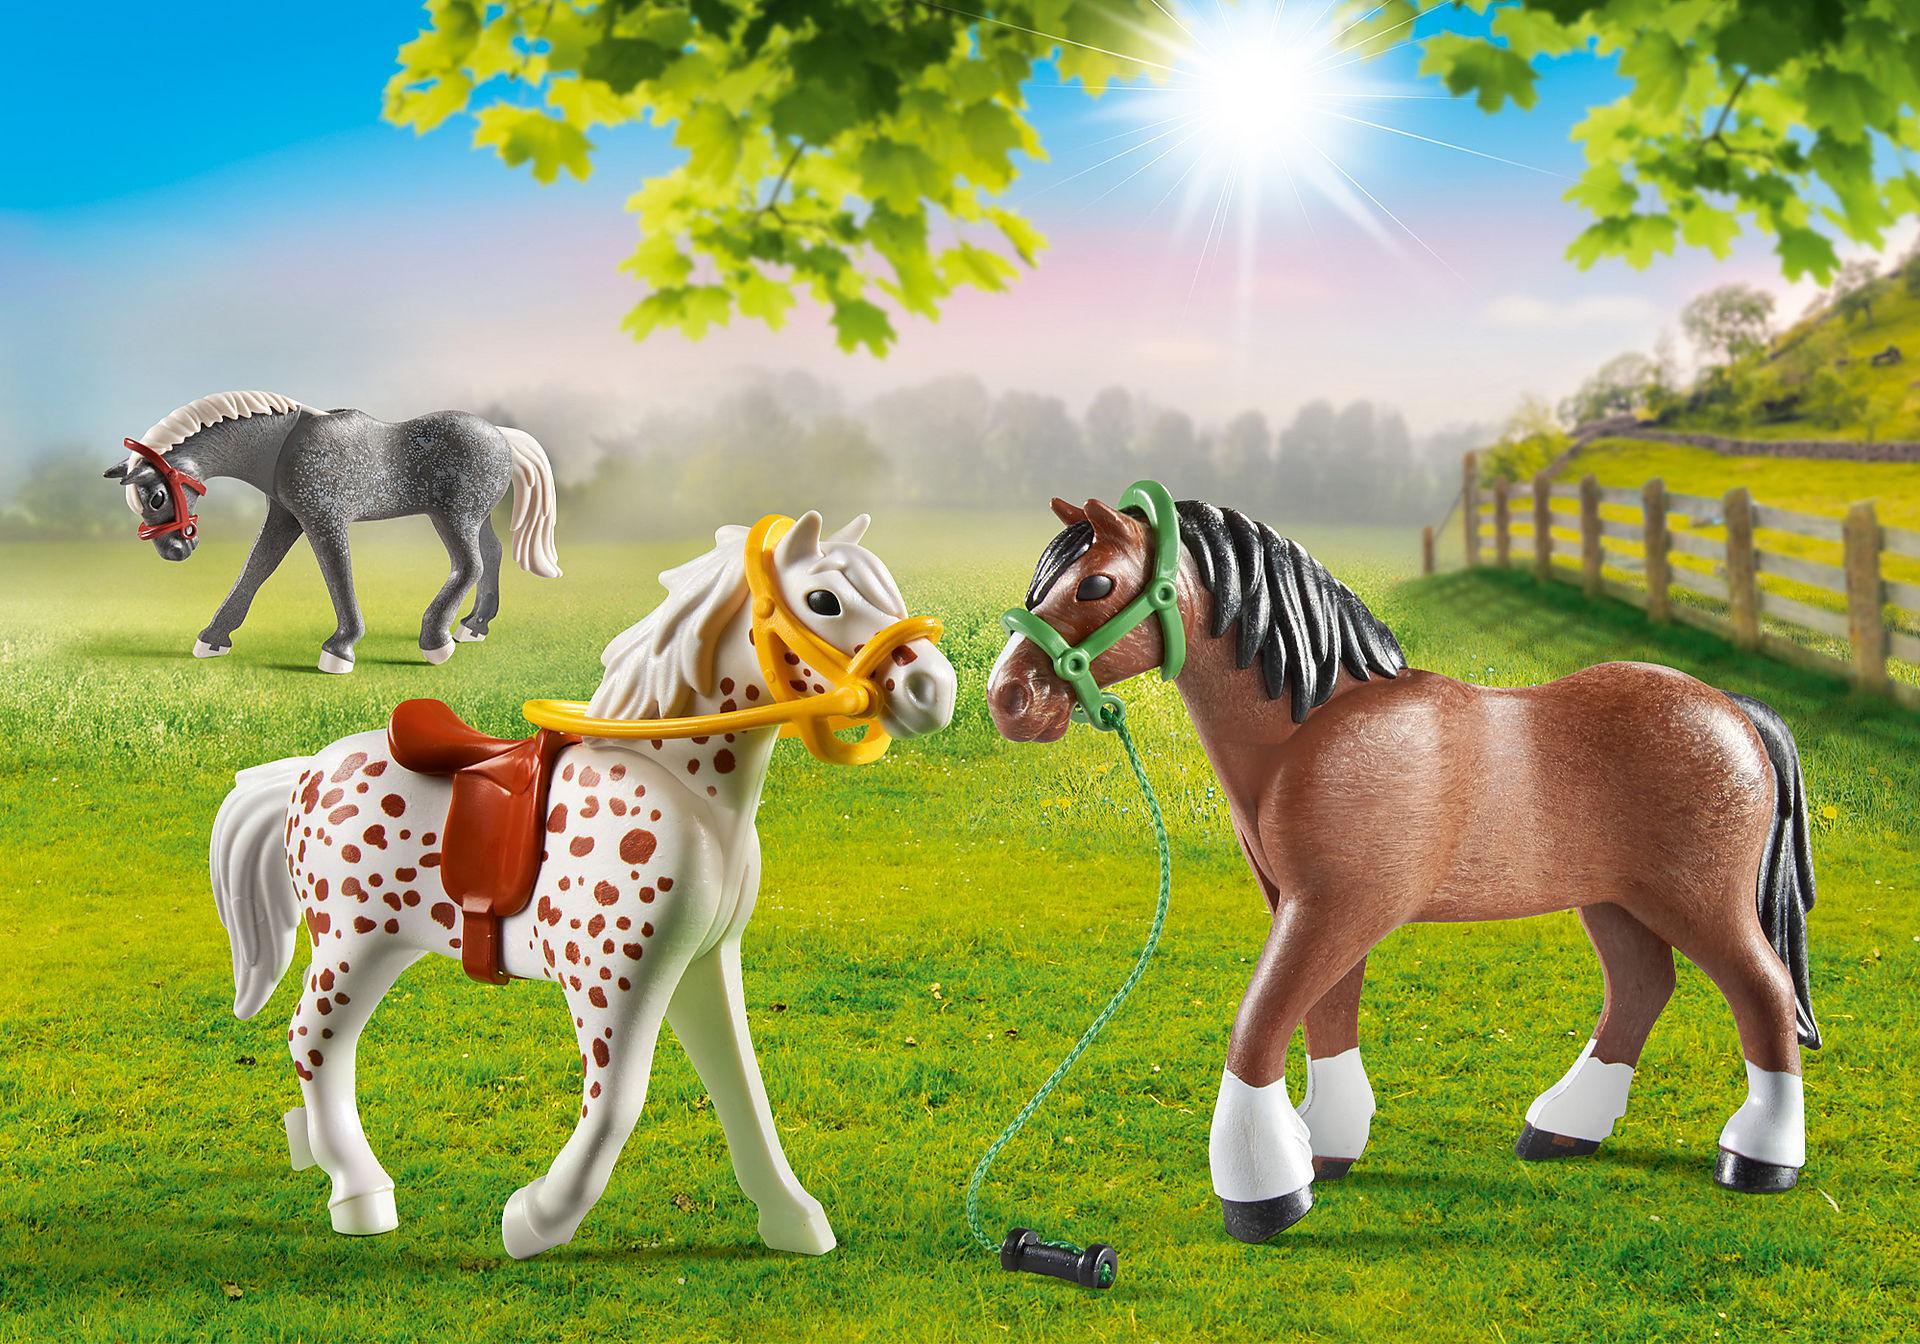 70683 3 hästar zoom image1